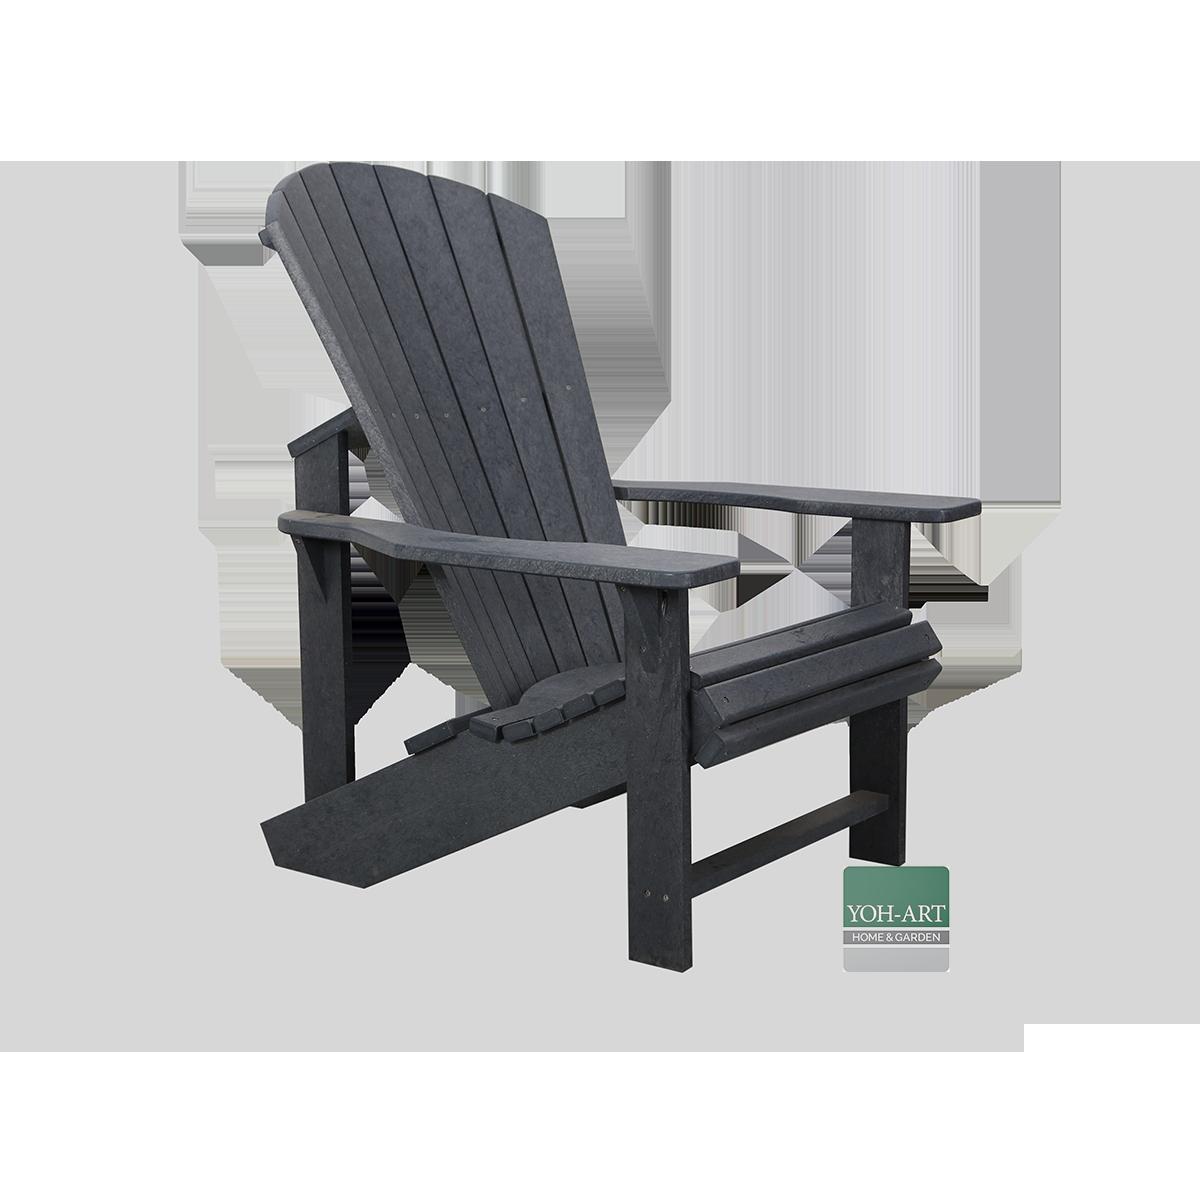 Adirondack Muskoka Stuhl In Vielen Farben